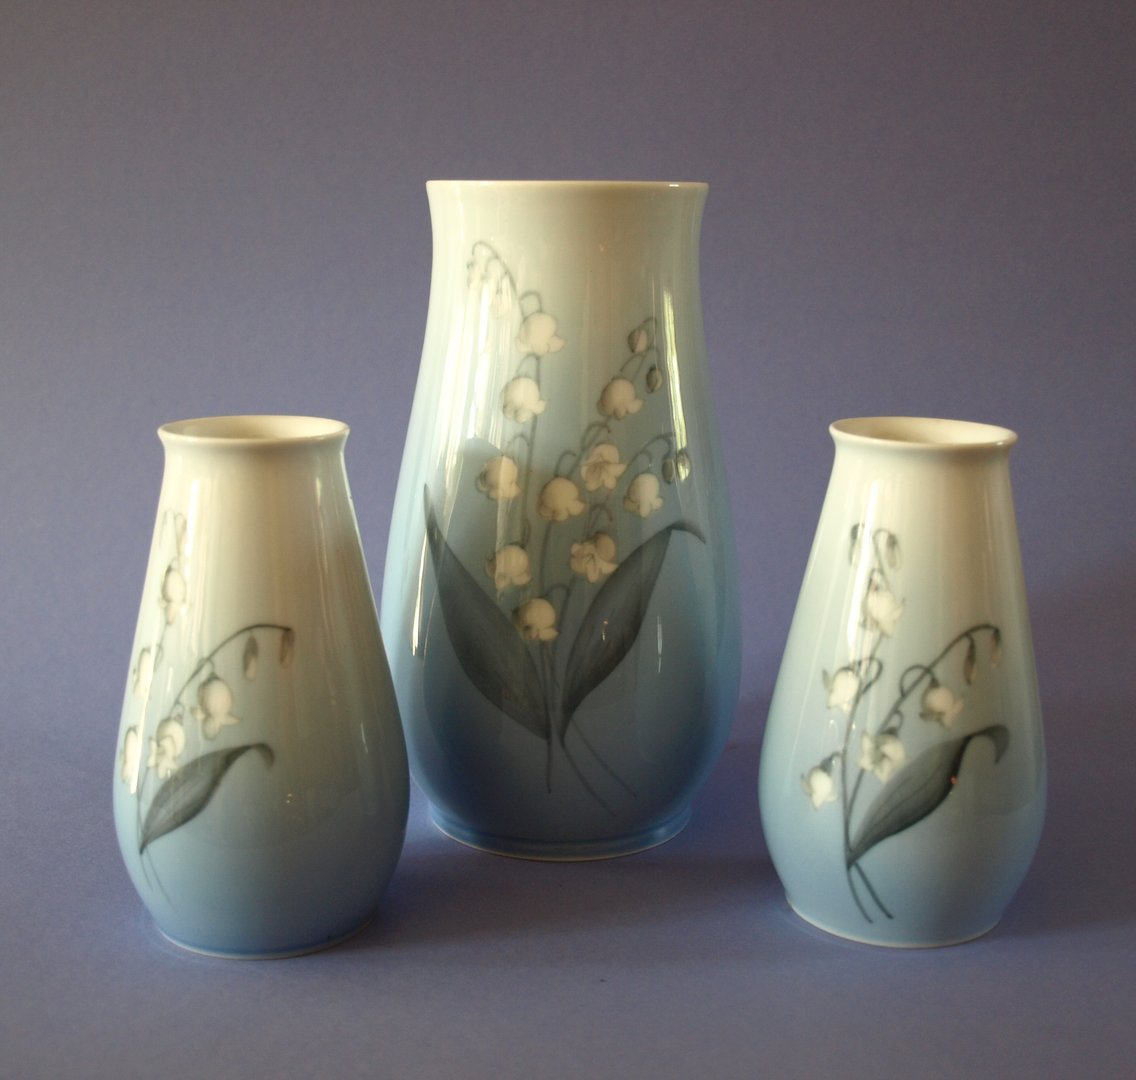 vasenpaar bing gr ndahl royal copenhagen maigl ckchen formsch n. Black Bedroom Furniture Sets. Home Design Ideas